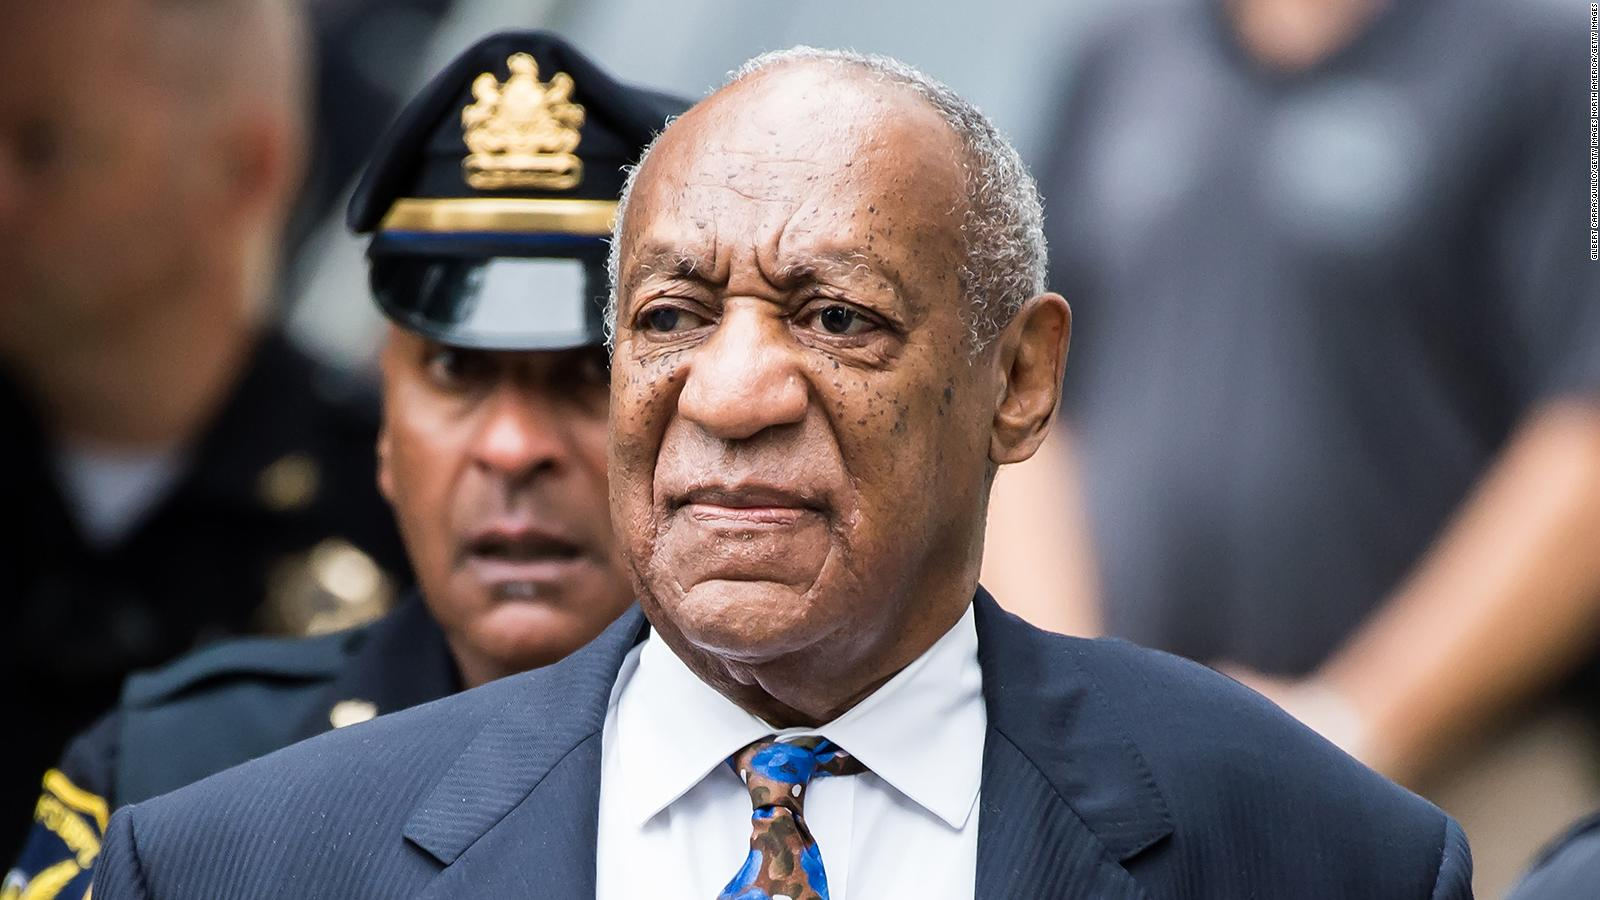 Bill Cosby niegan libertad condicional